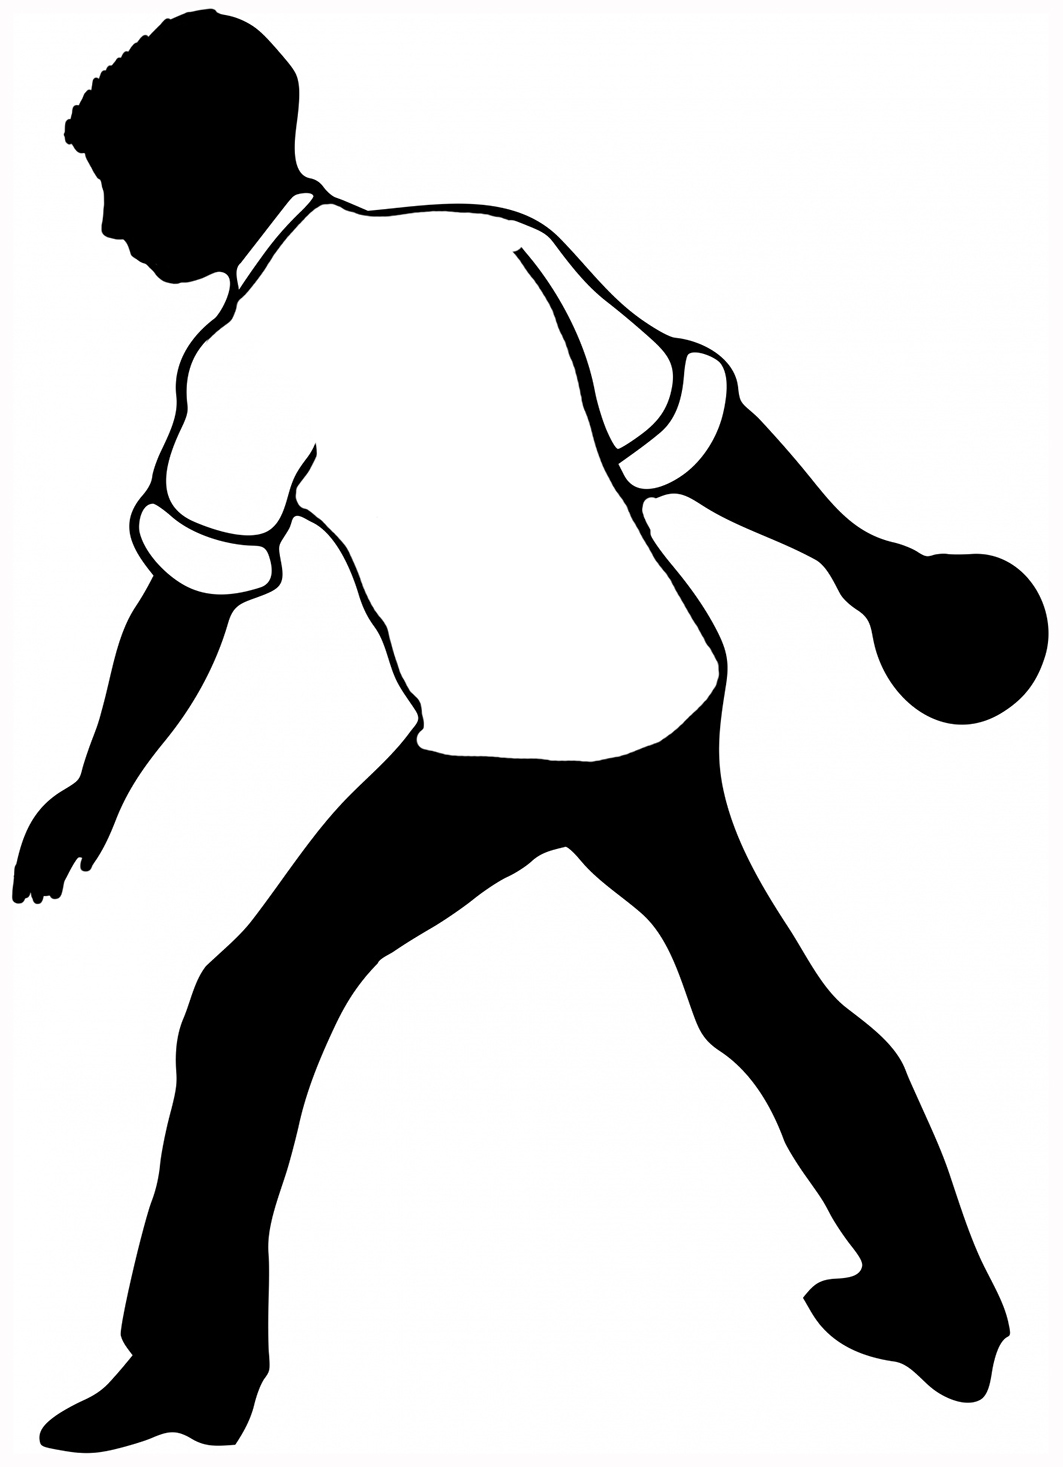 1063x1467 Bowling Clipart